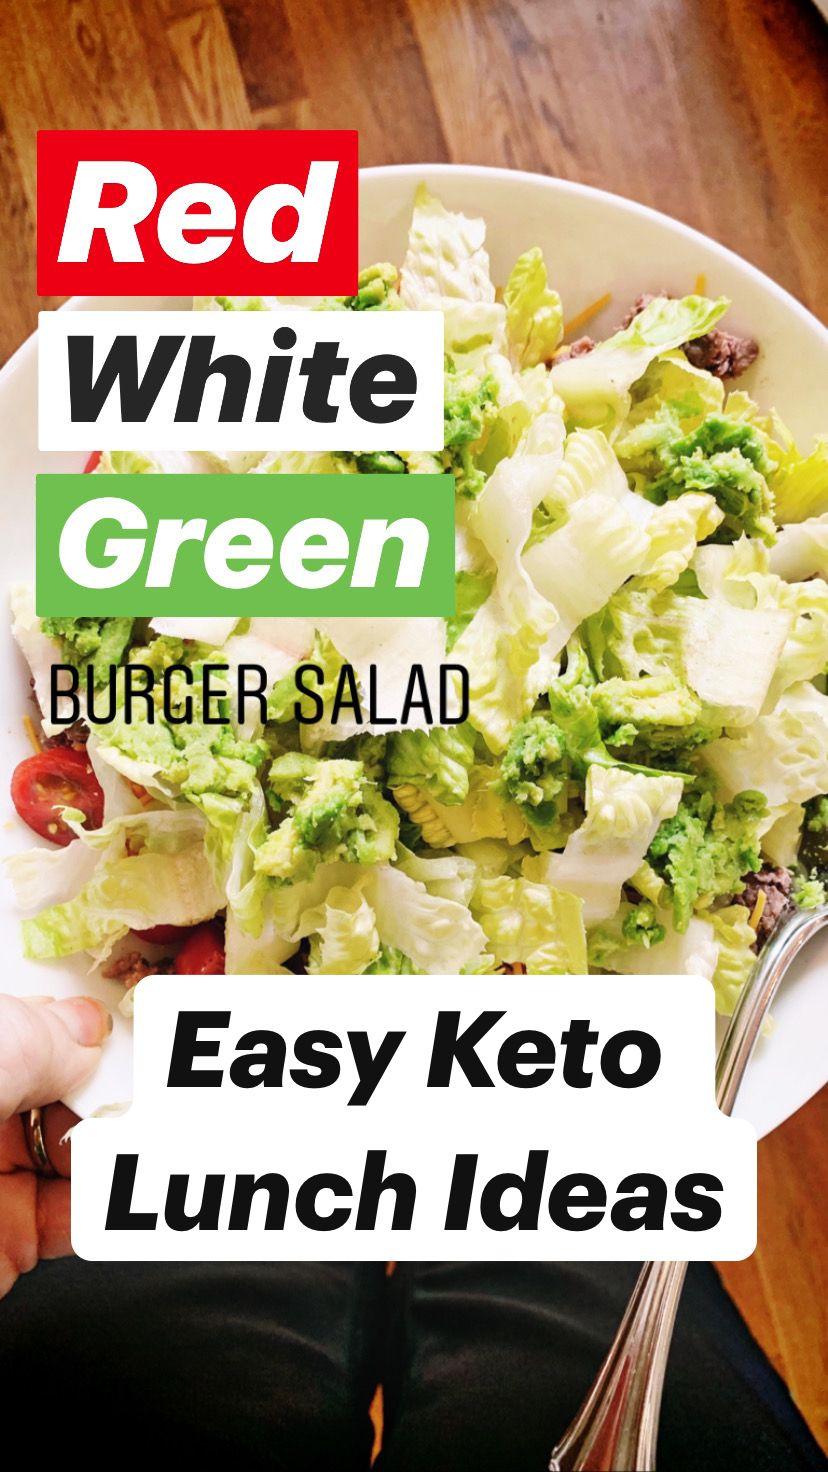 Easy Keto Lunch Ideas